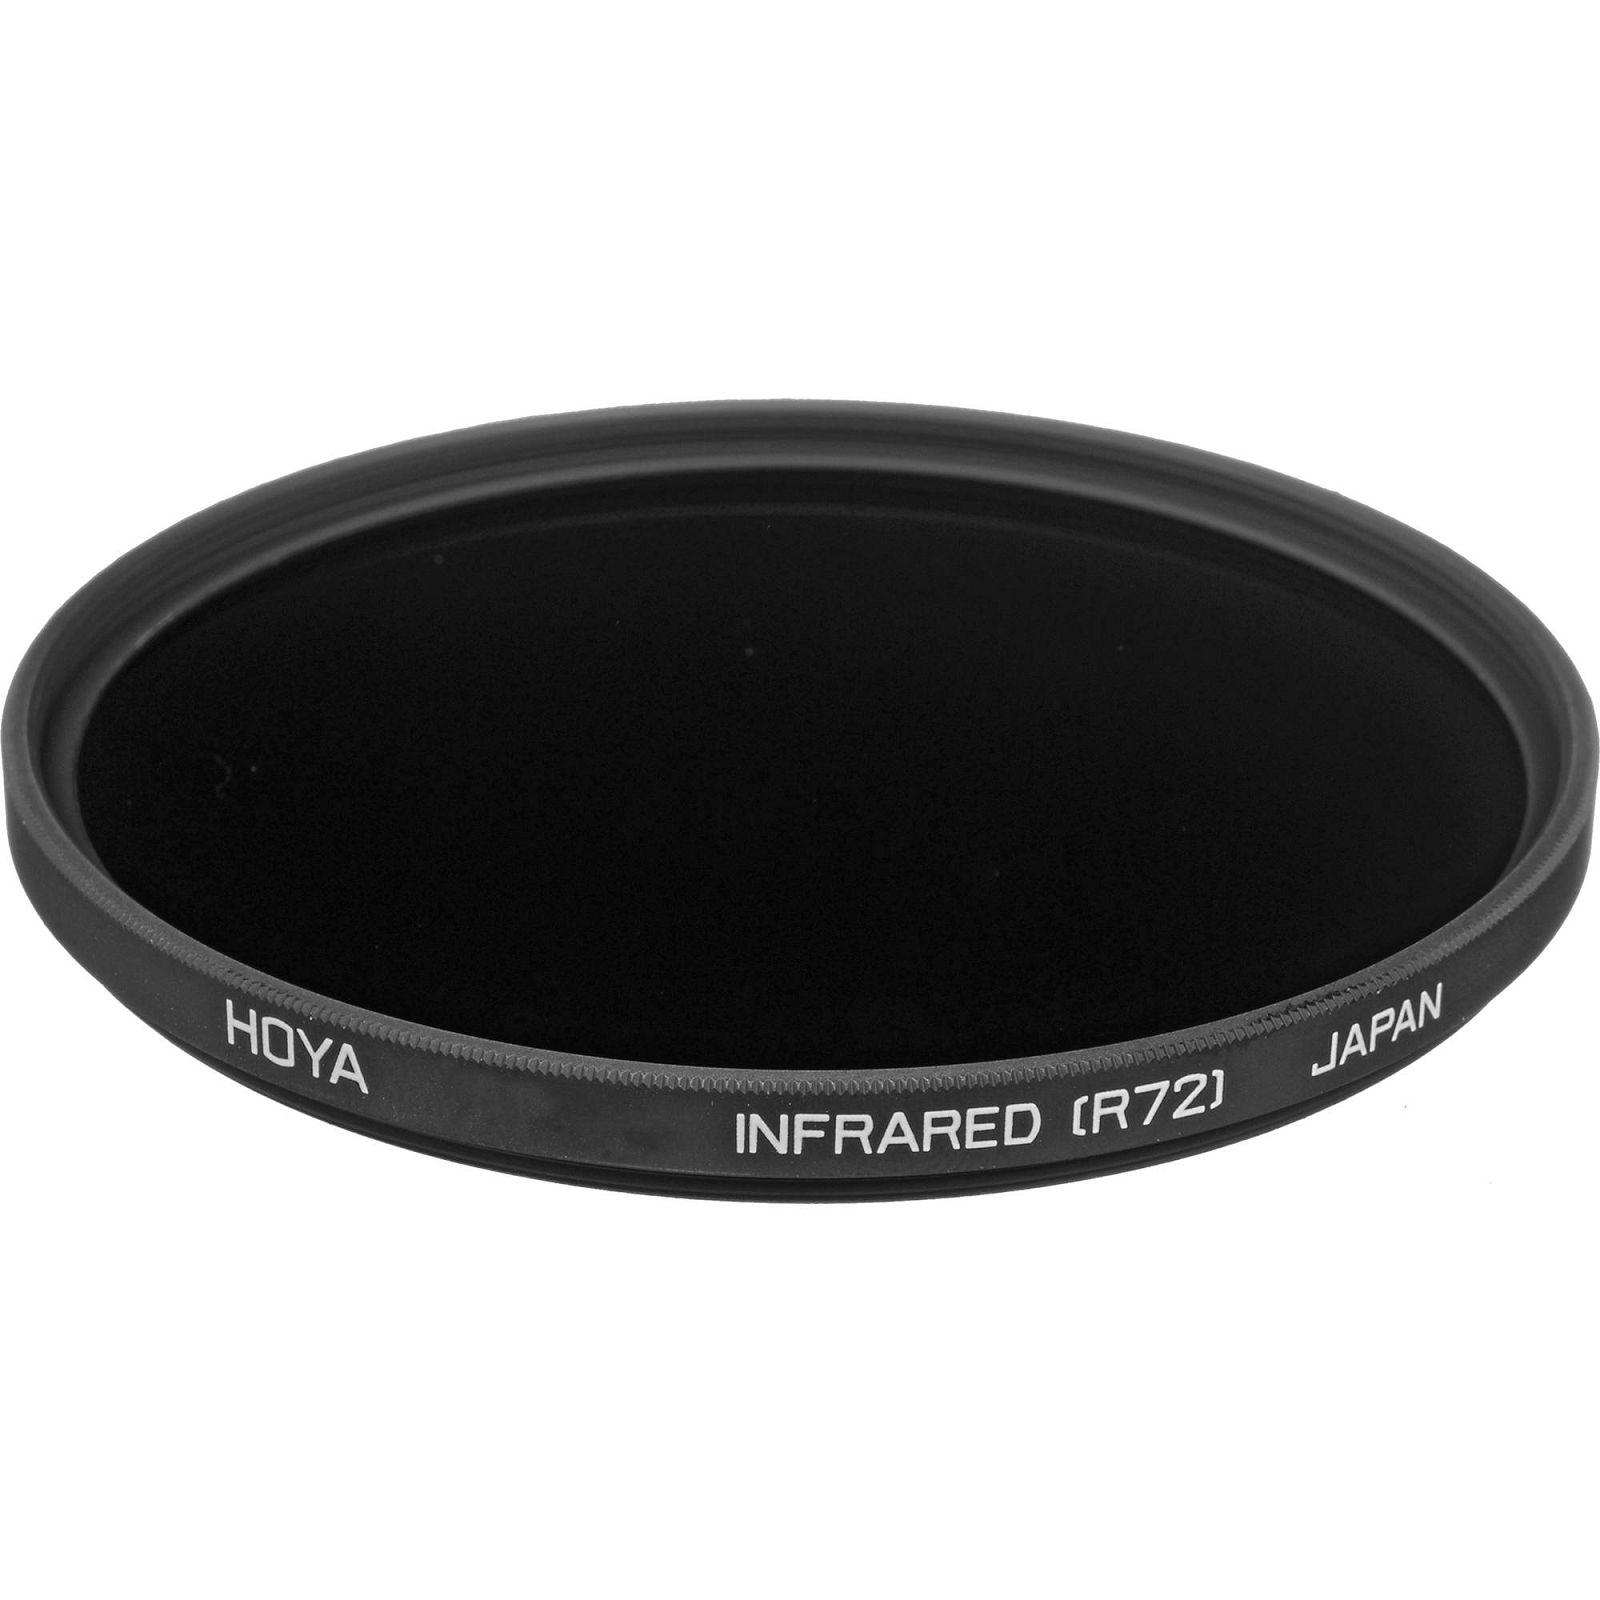 Hoya Infrared R72 filter 82mm